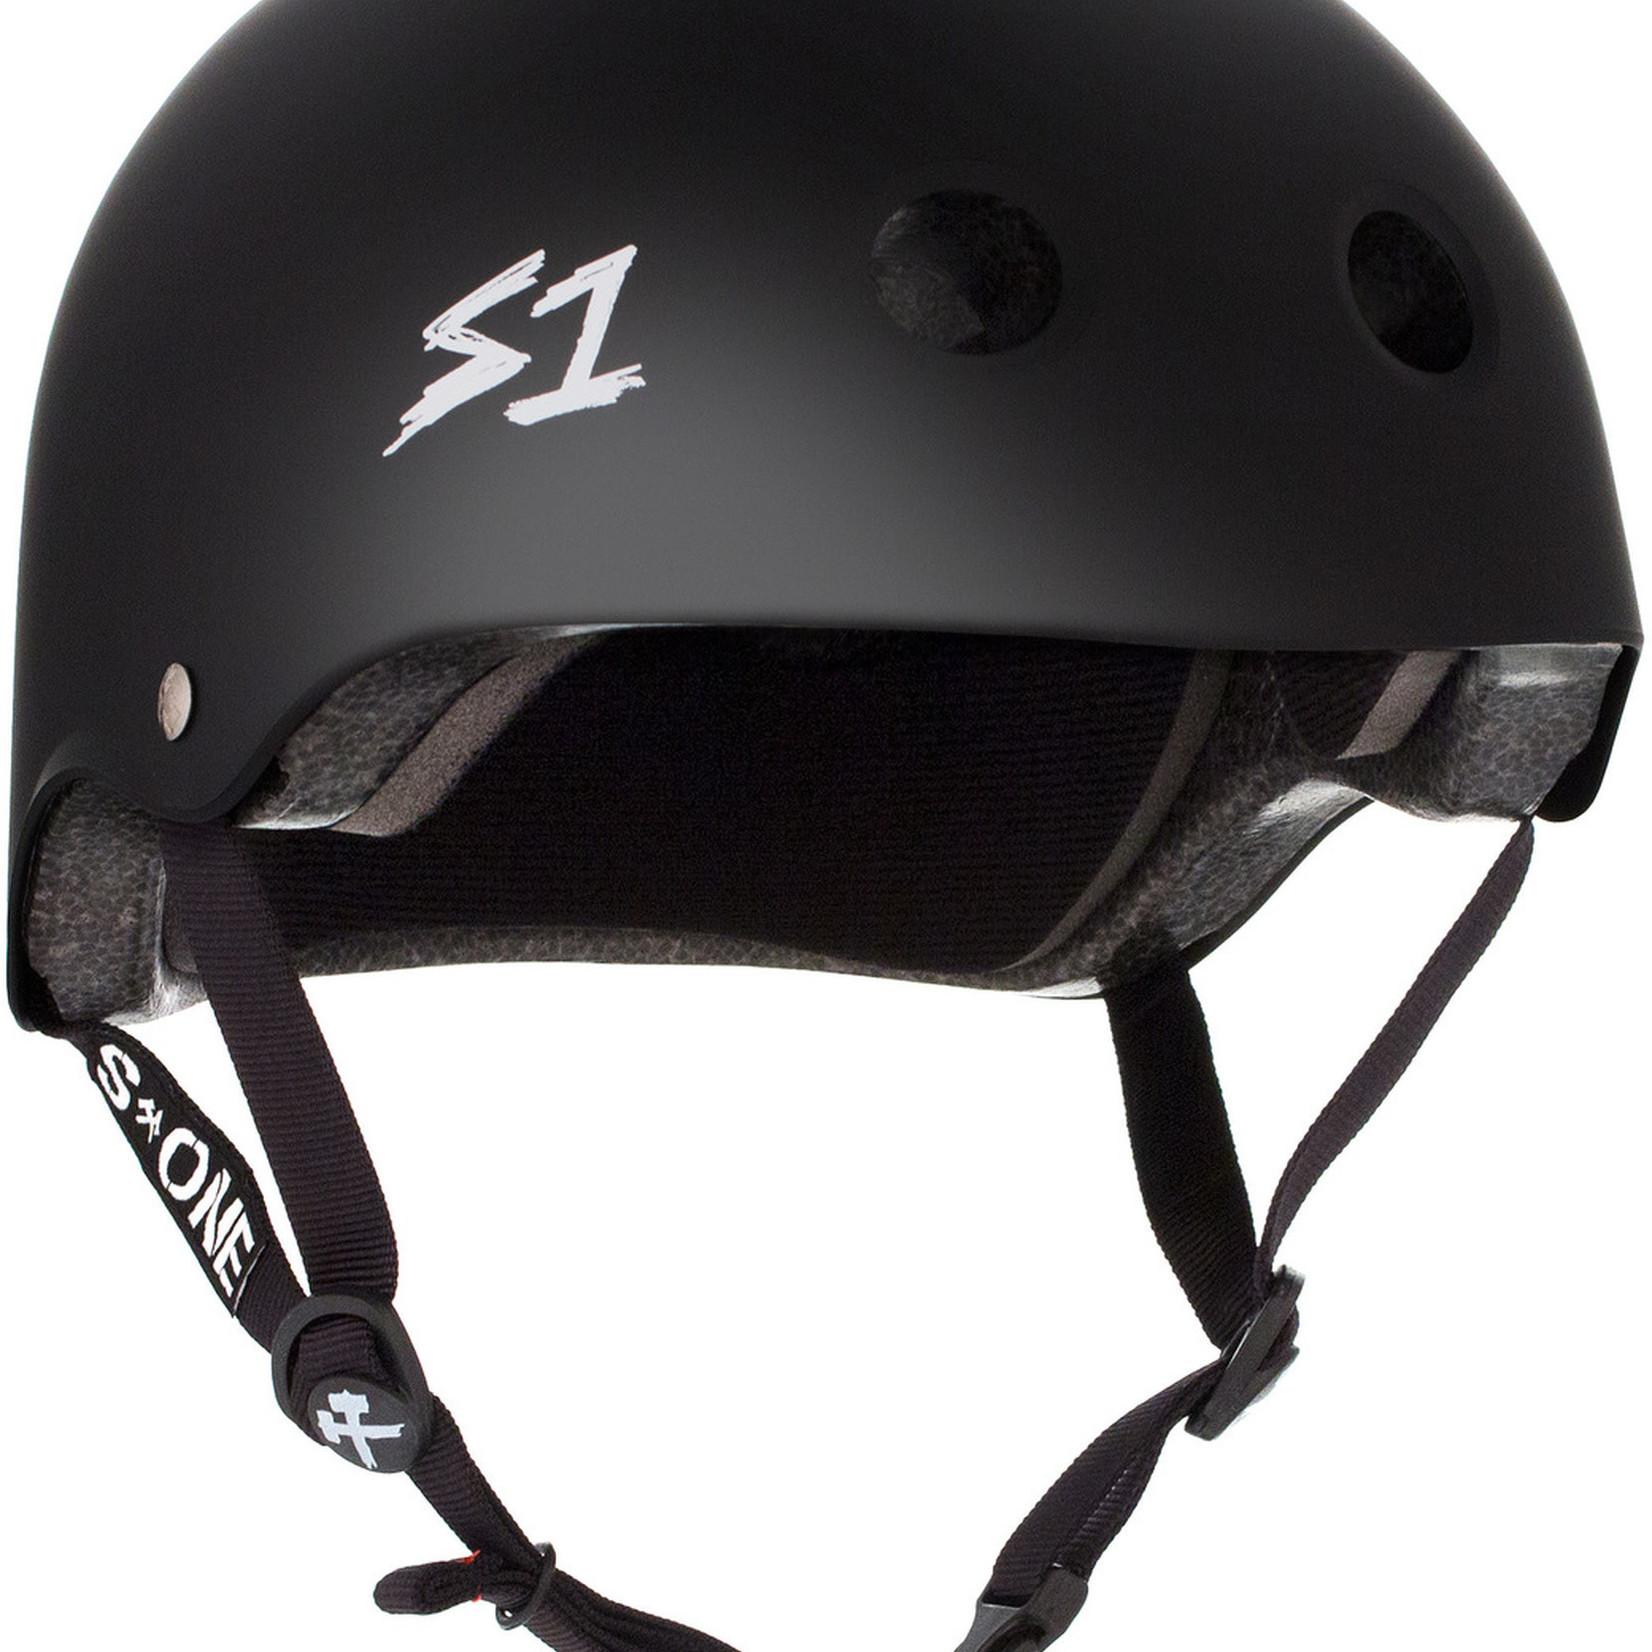 S-One S-One Lifer Helmet